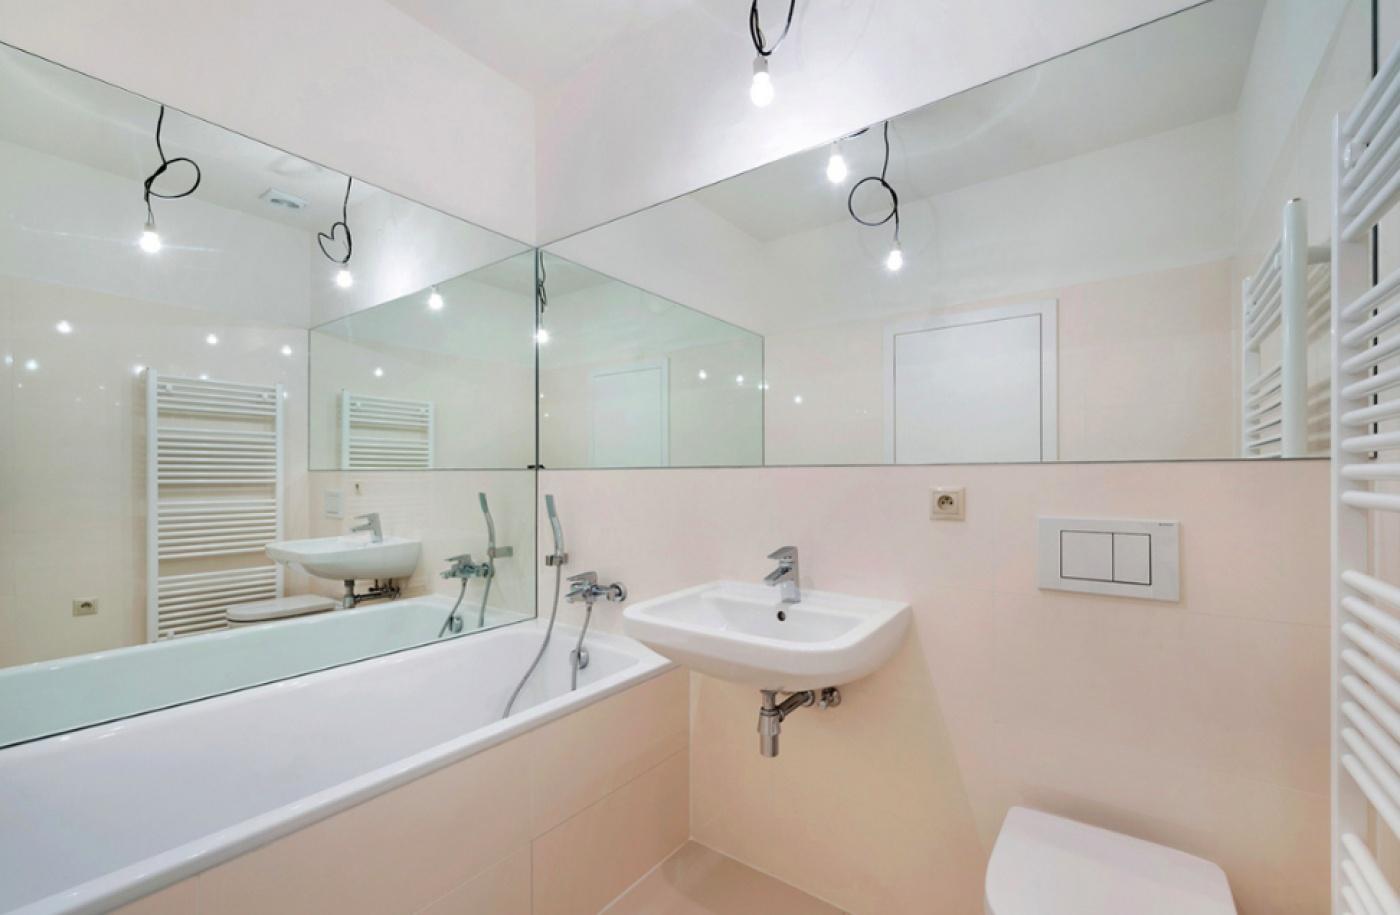 Půdní byt 3+kk, plocha 73 m², ulice Žižkovo náměstí, Praha 3 - Žižkov, cena 6 472 000 Kč | 4